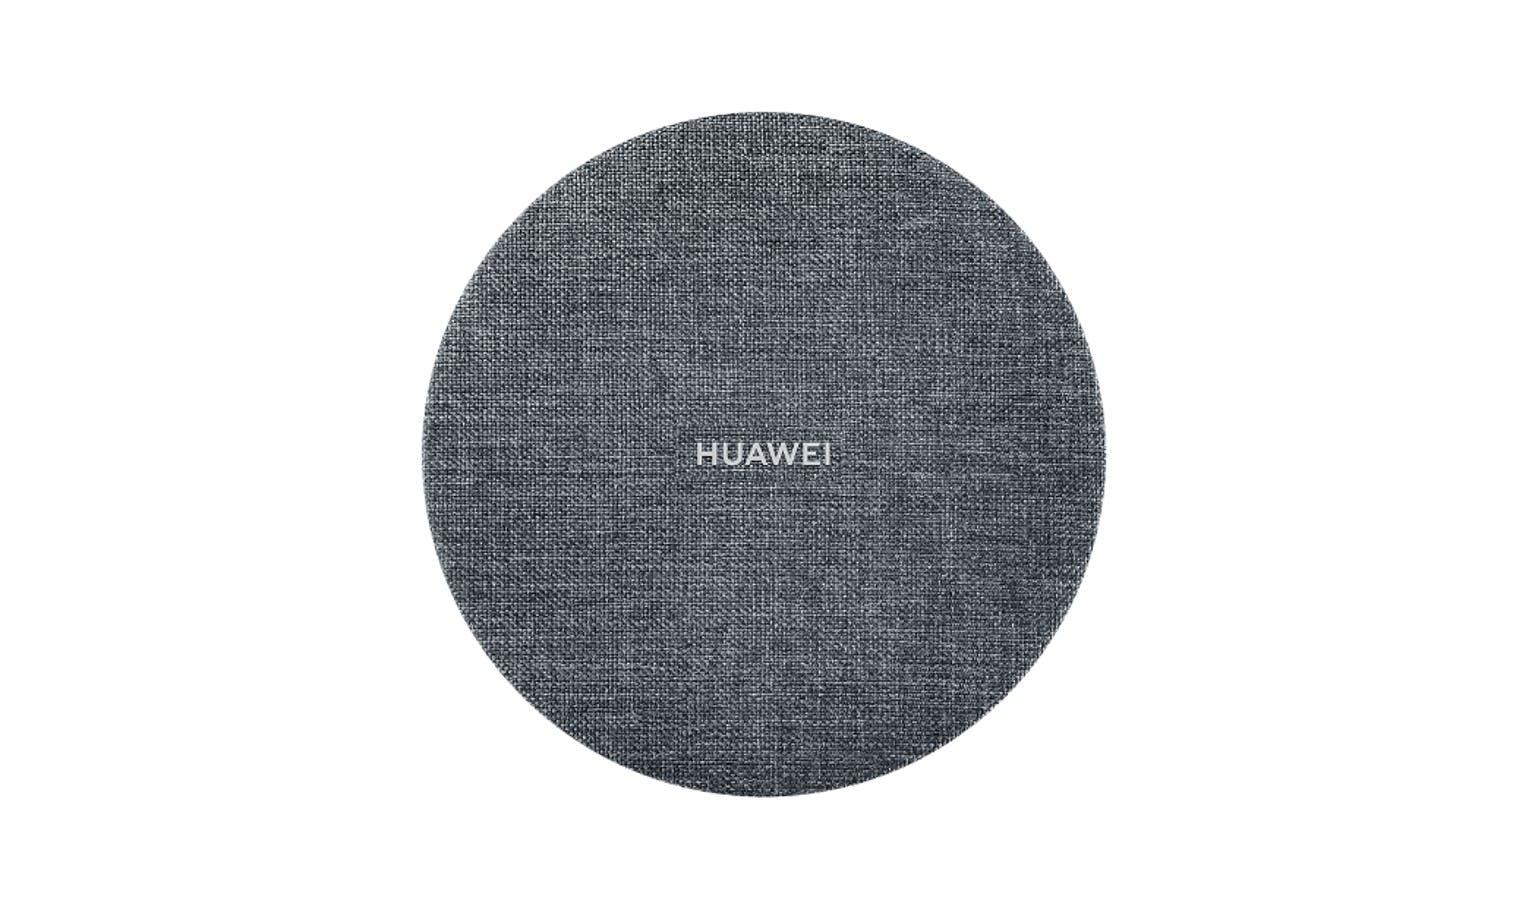 Huawei 1 TB Back-up Storage - Grey